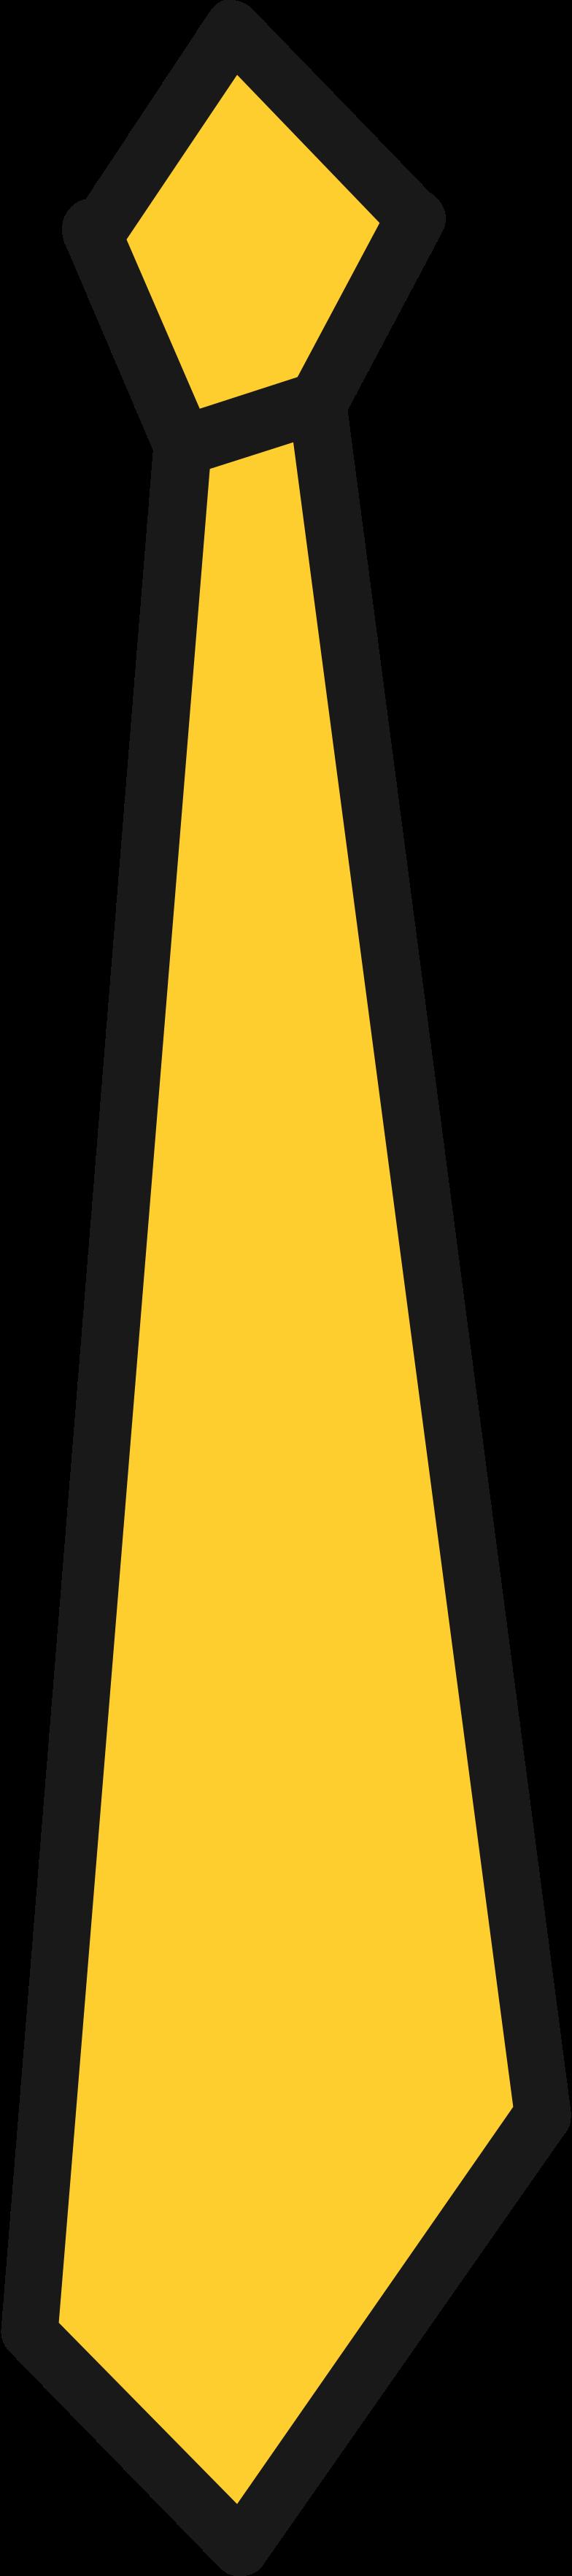 tie Clipart illustration in PNG, SVG